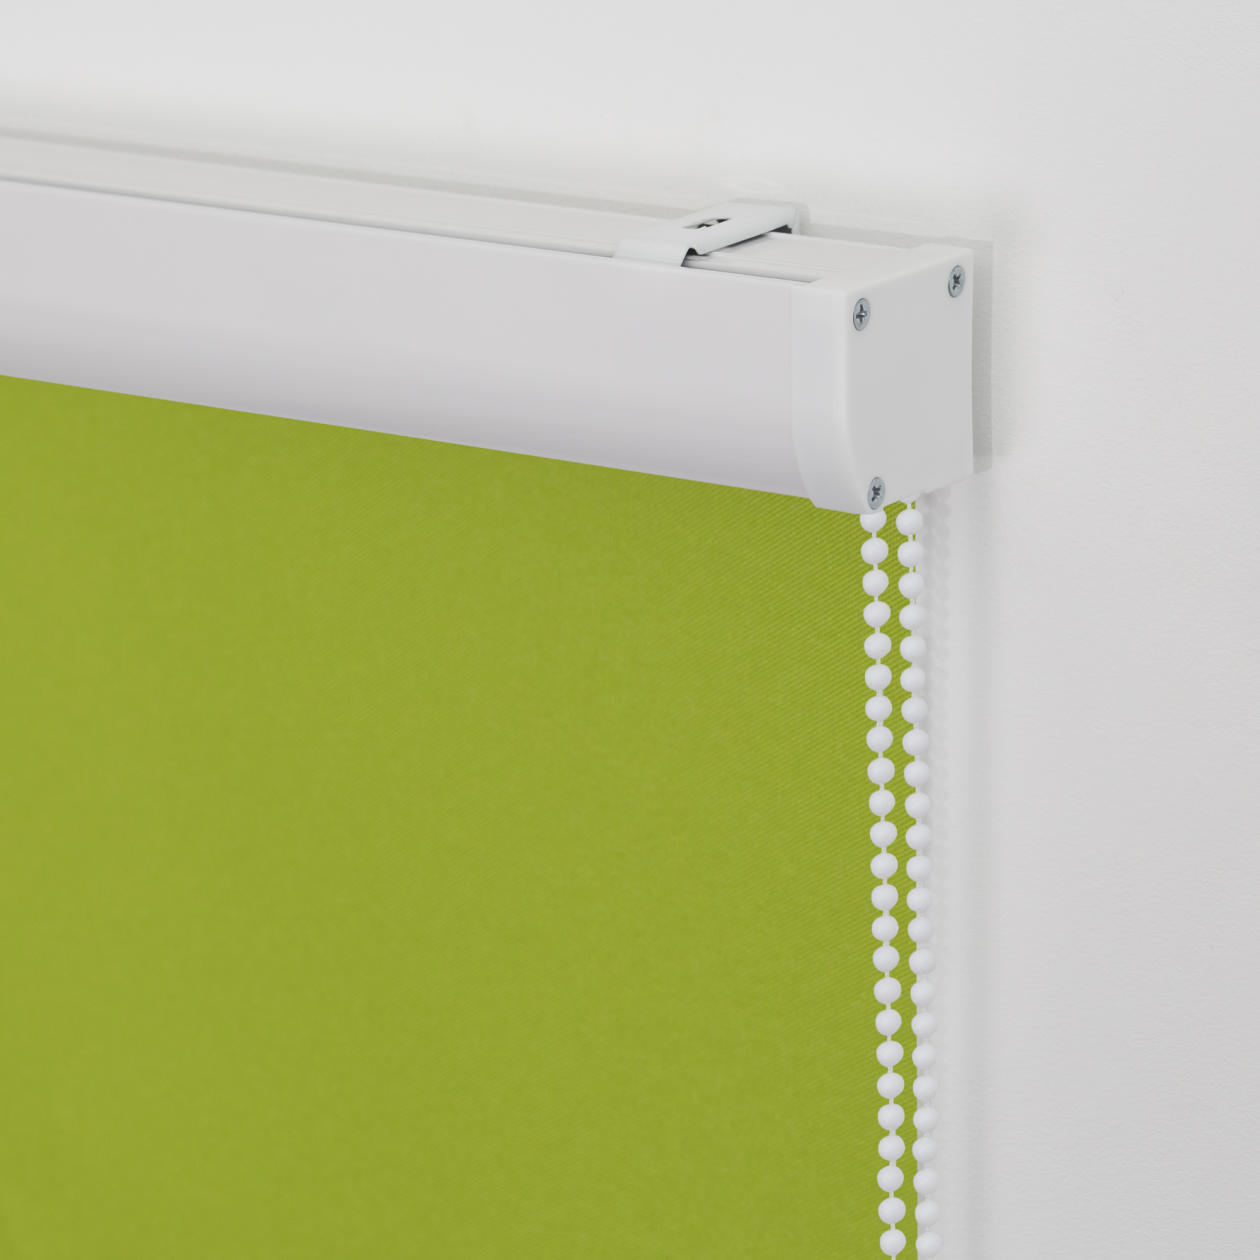 thermo rollo verdunkelungsrollo klebfix mit kassette ohne bohren verdunkelung lichblick shop. Black Bedroom Furniture Sets. Home Design Ideas